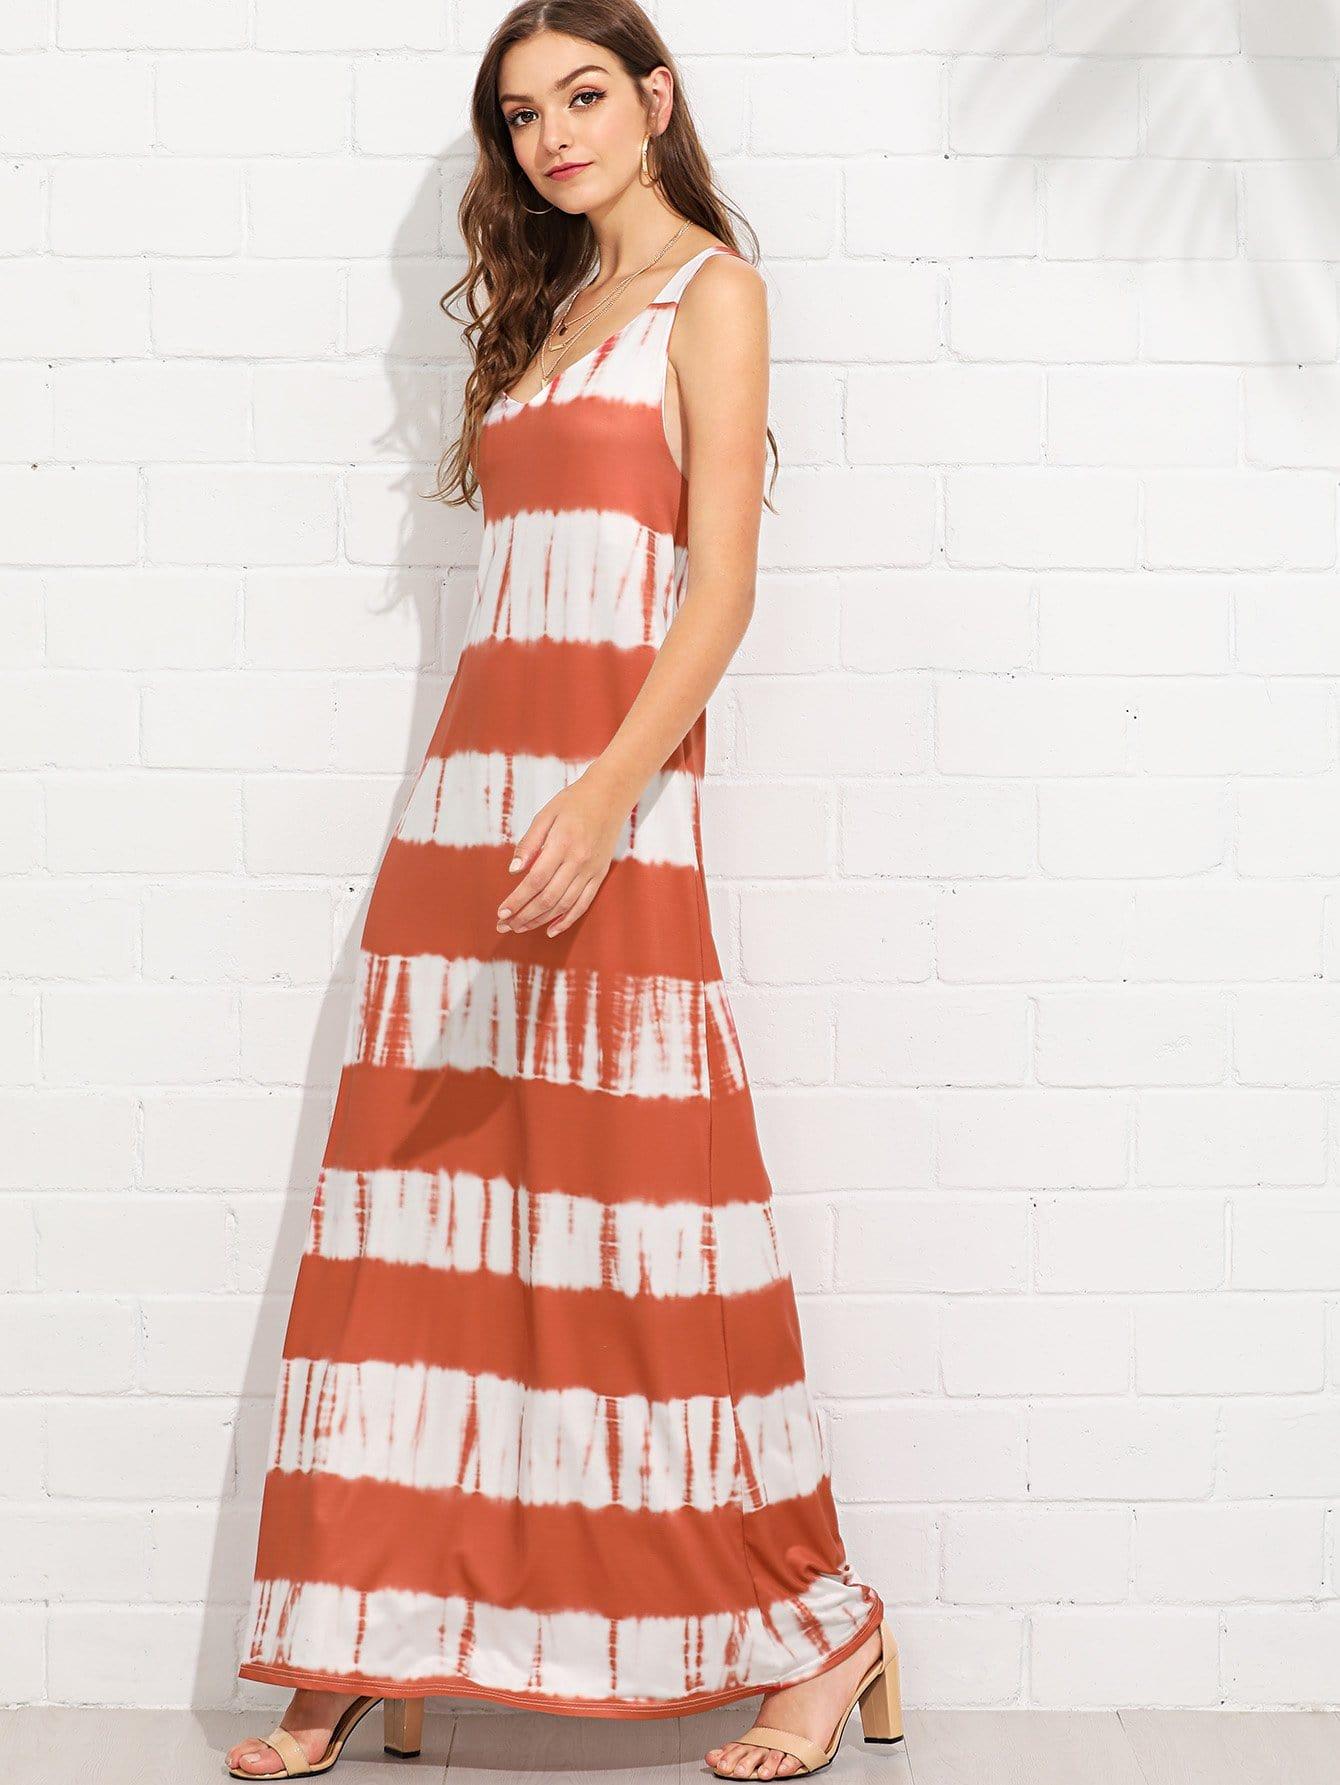 Deep V Neckline Tie Dye Dress